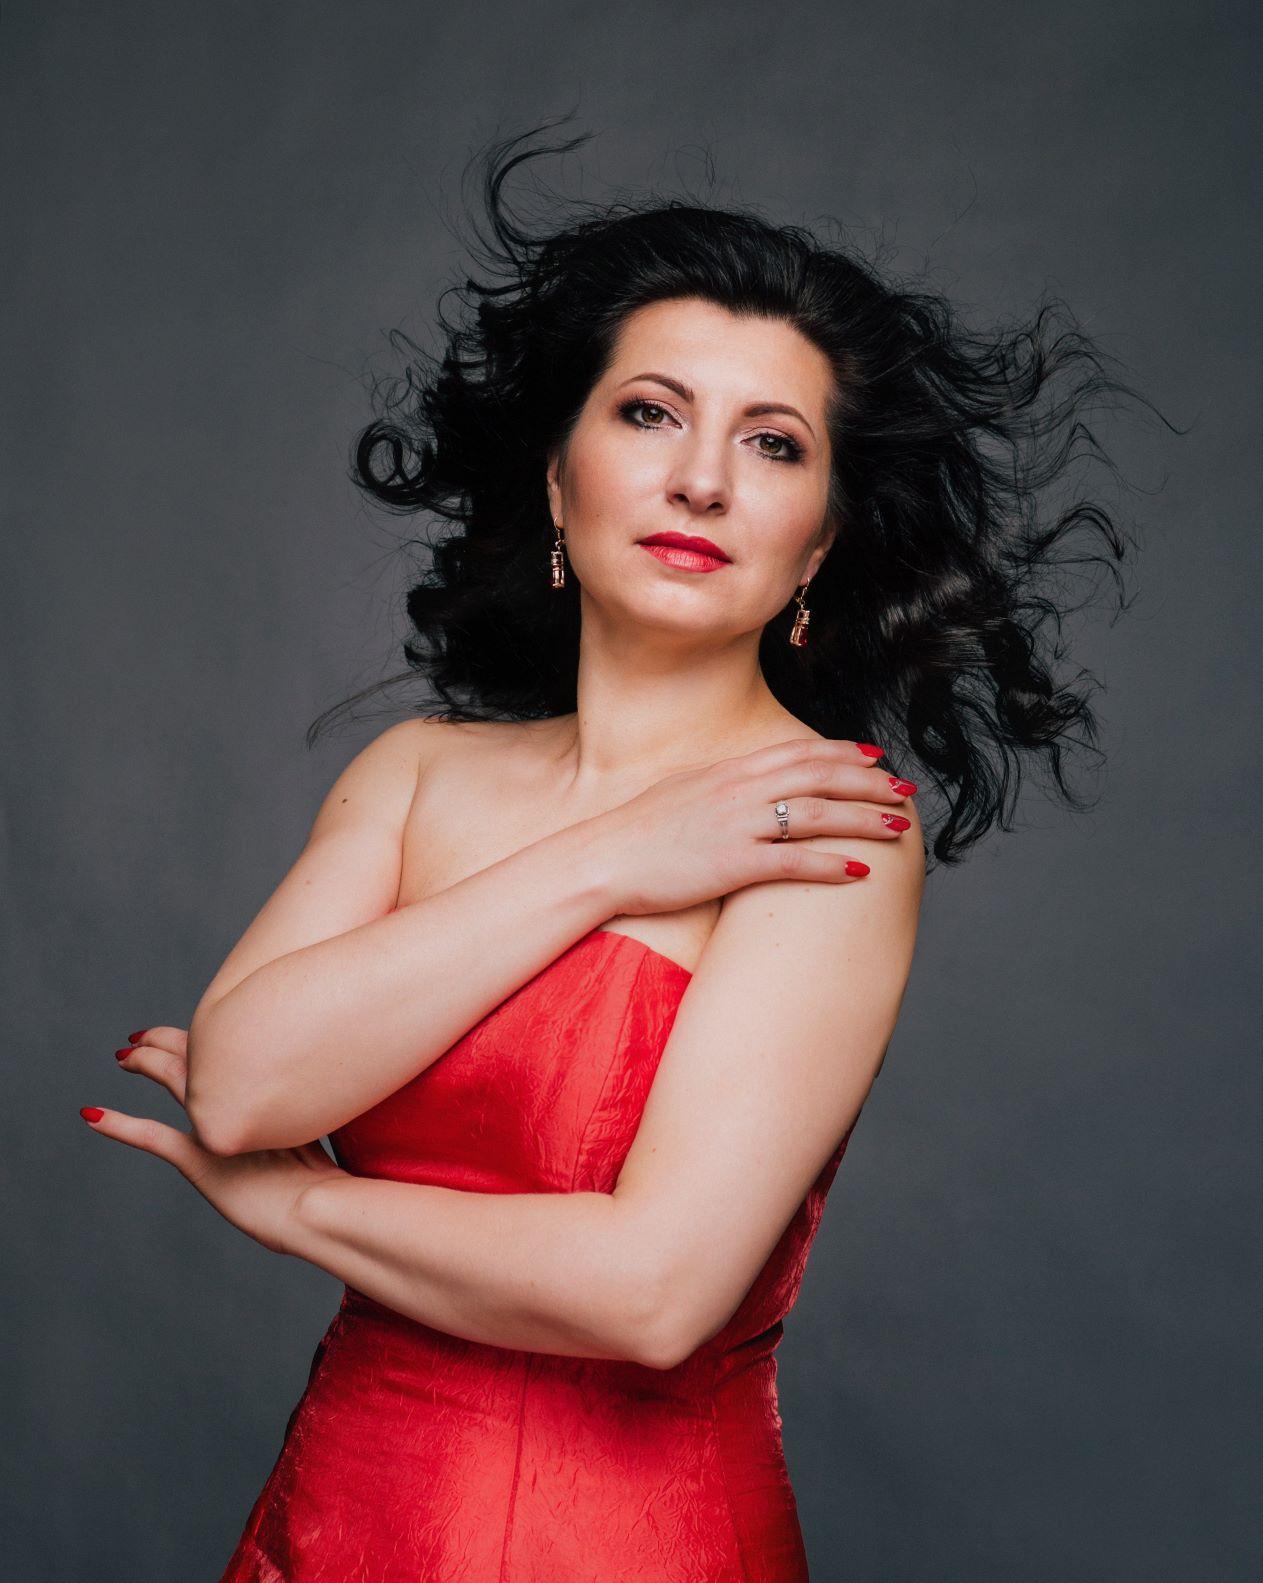 Zoya Tsererina - Picture nr #0